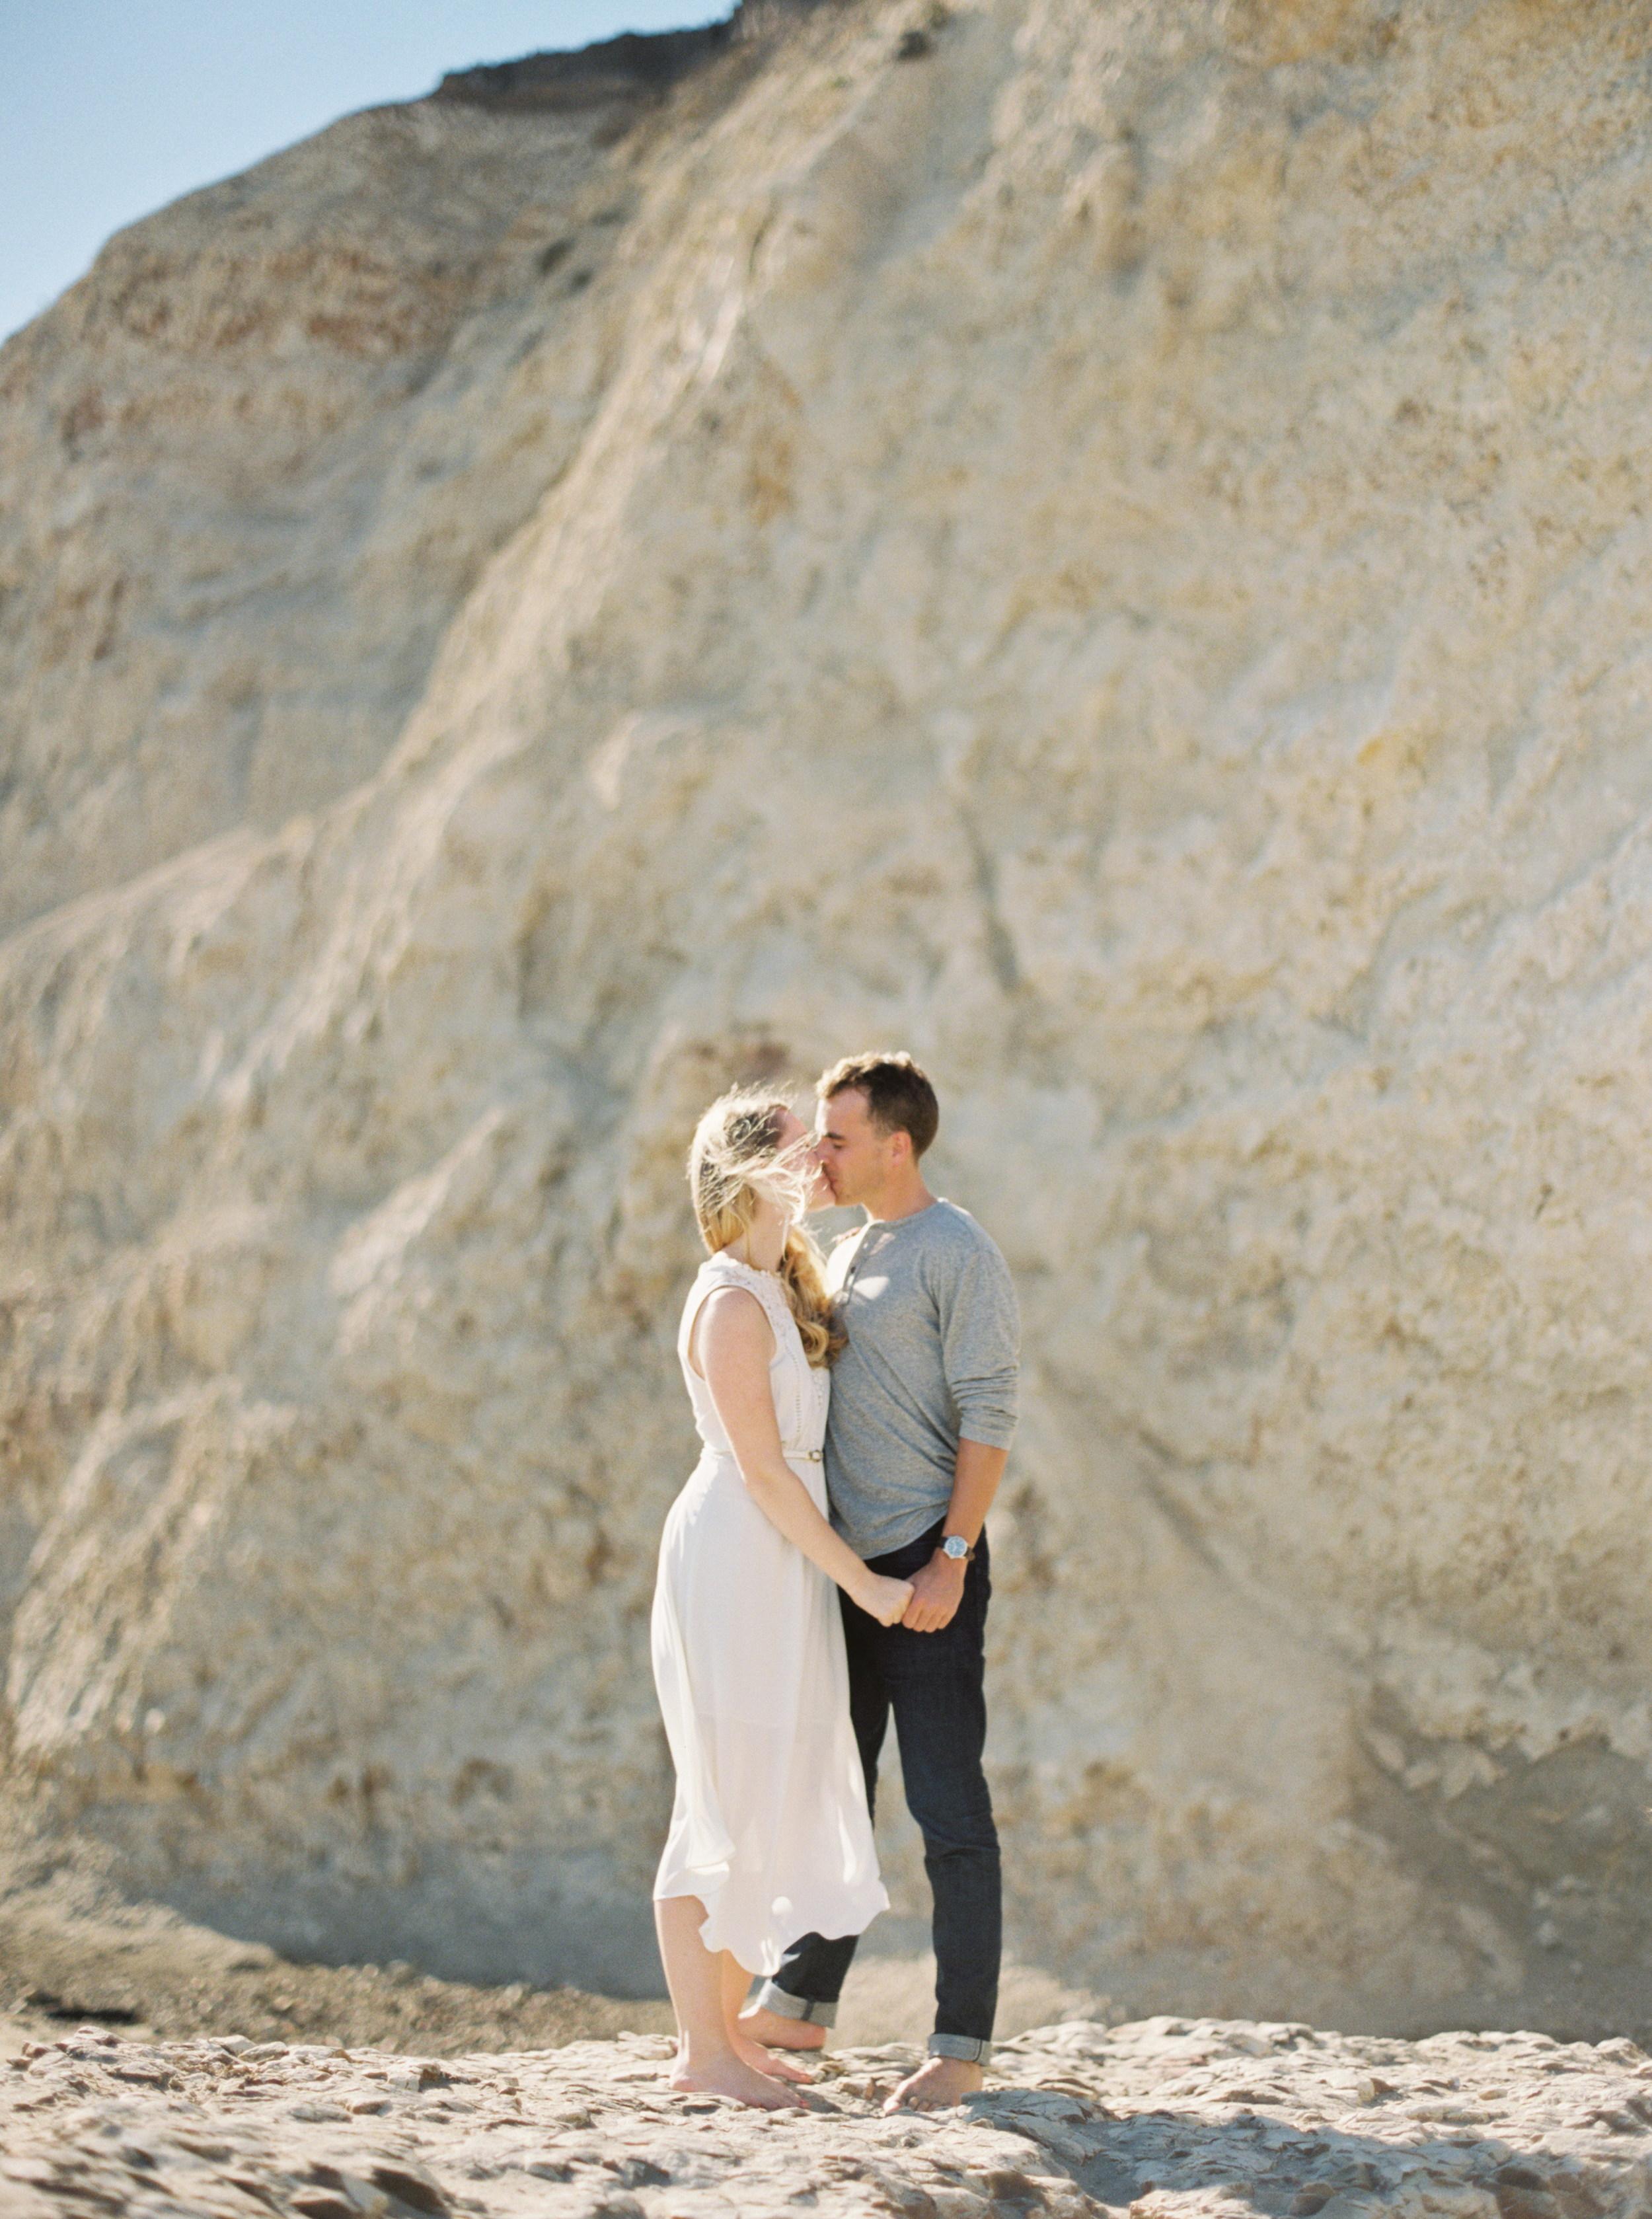 Kyle John l Fine Art Wedding Photography l Chicago, Copenhagen, California, New York, Destination l Blog l Molly & Alex_10